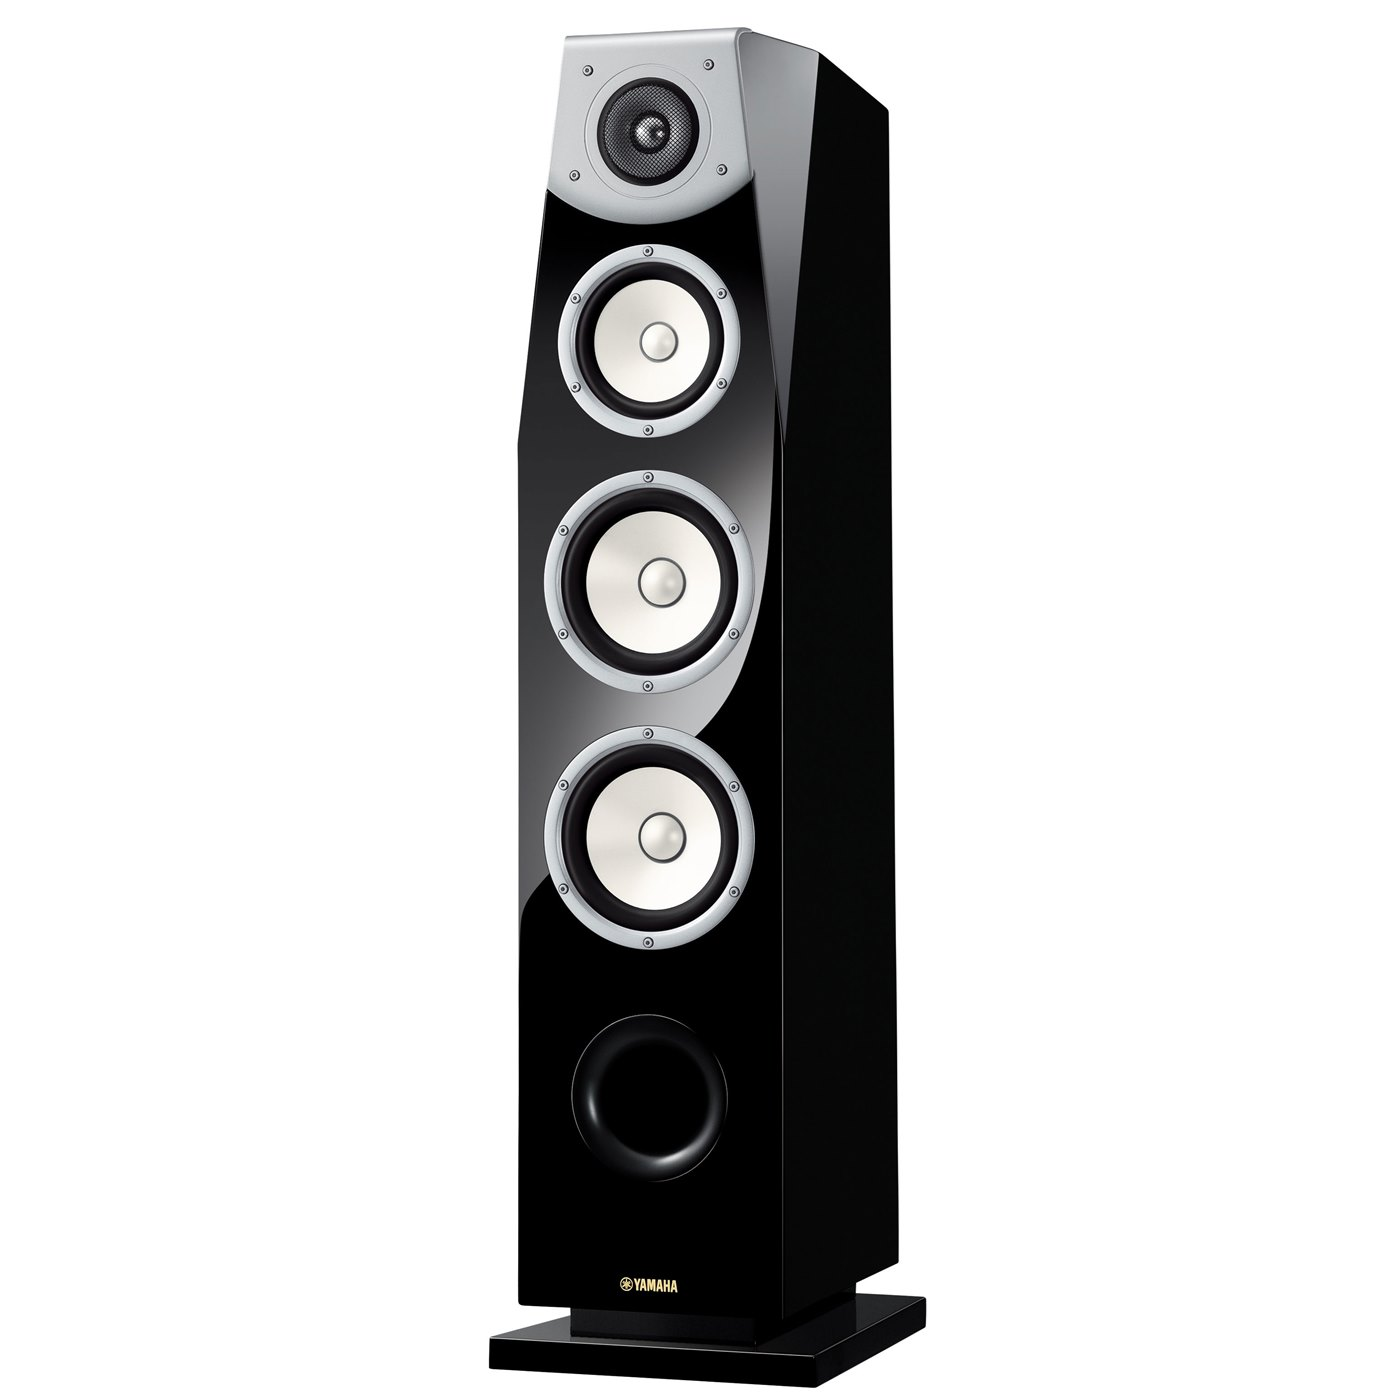 Acoustics Yamaha NS 777: characteristics, photos and reviews 64